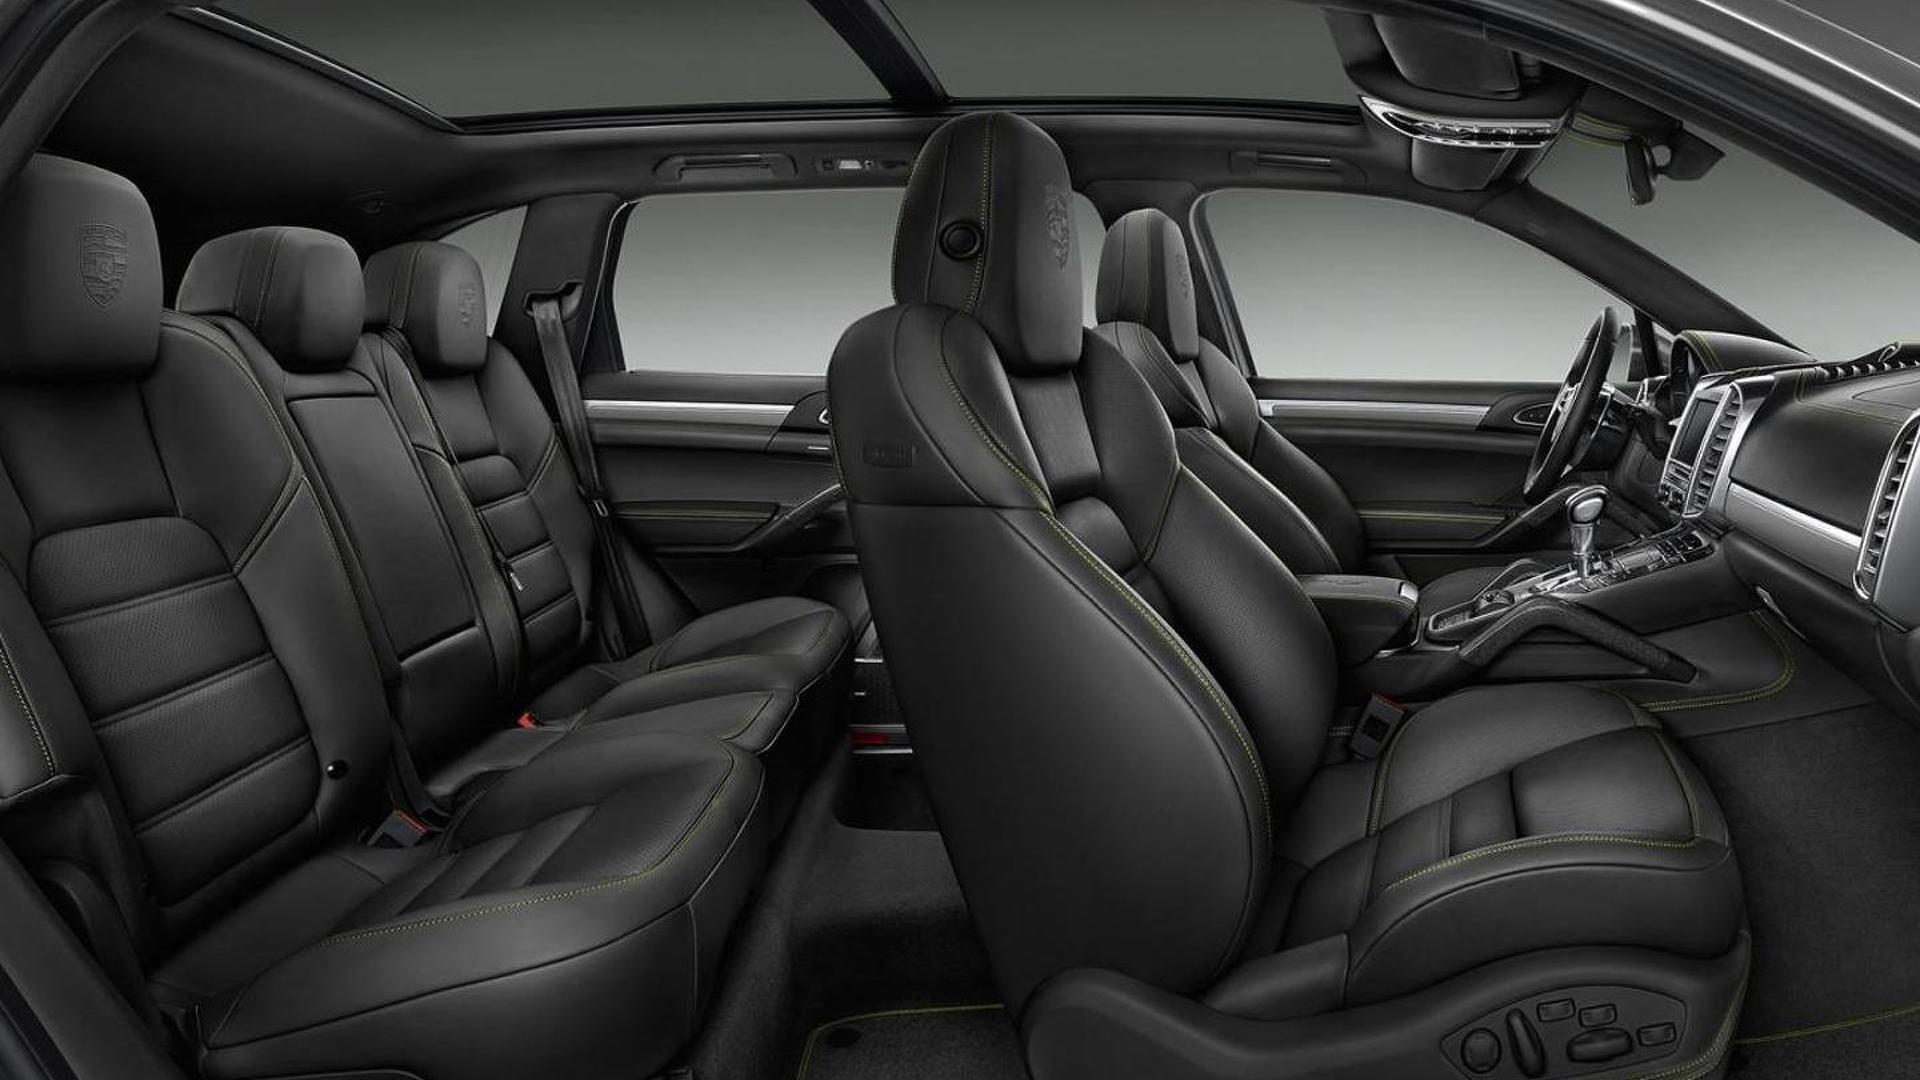 Фото салона Porsche Cayenne S E-Hybrid от Porsche Exclusive